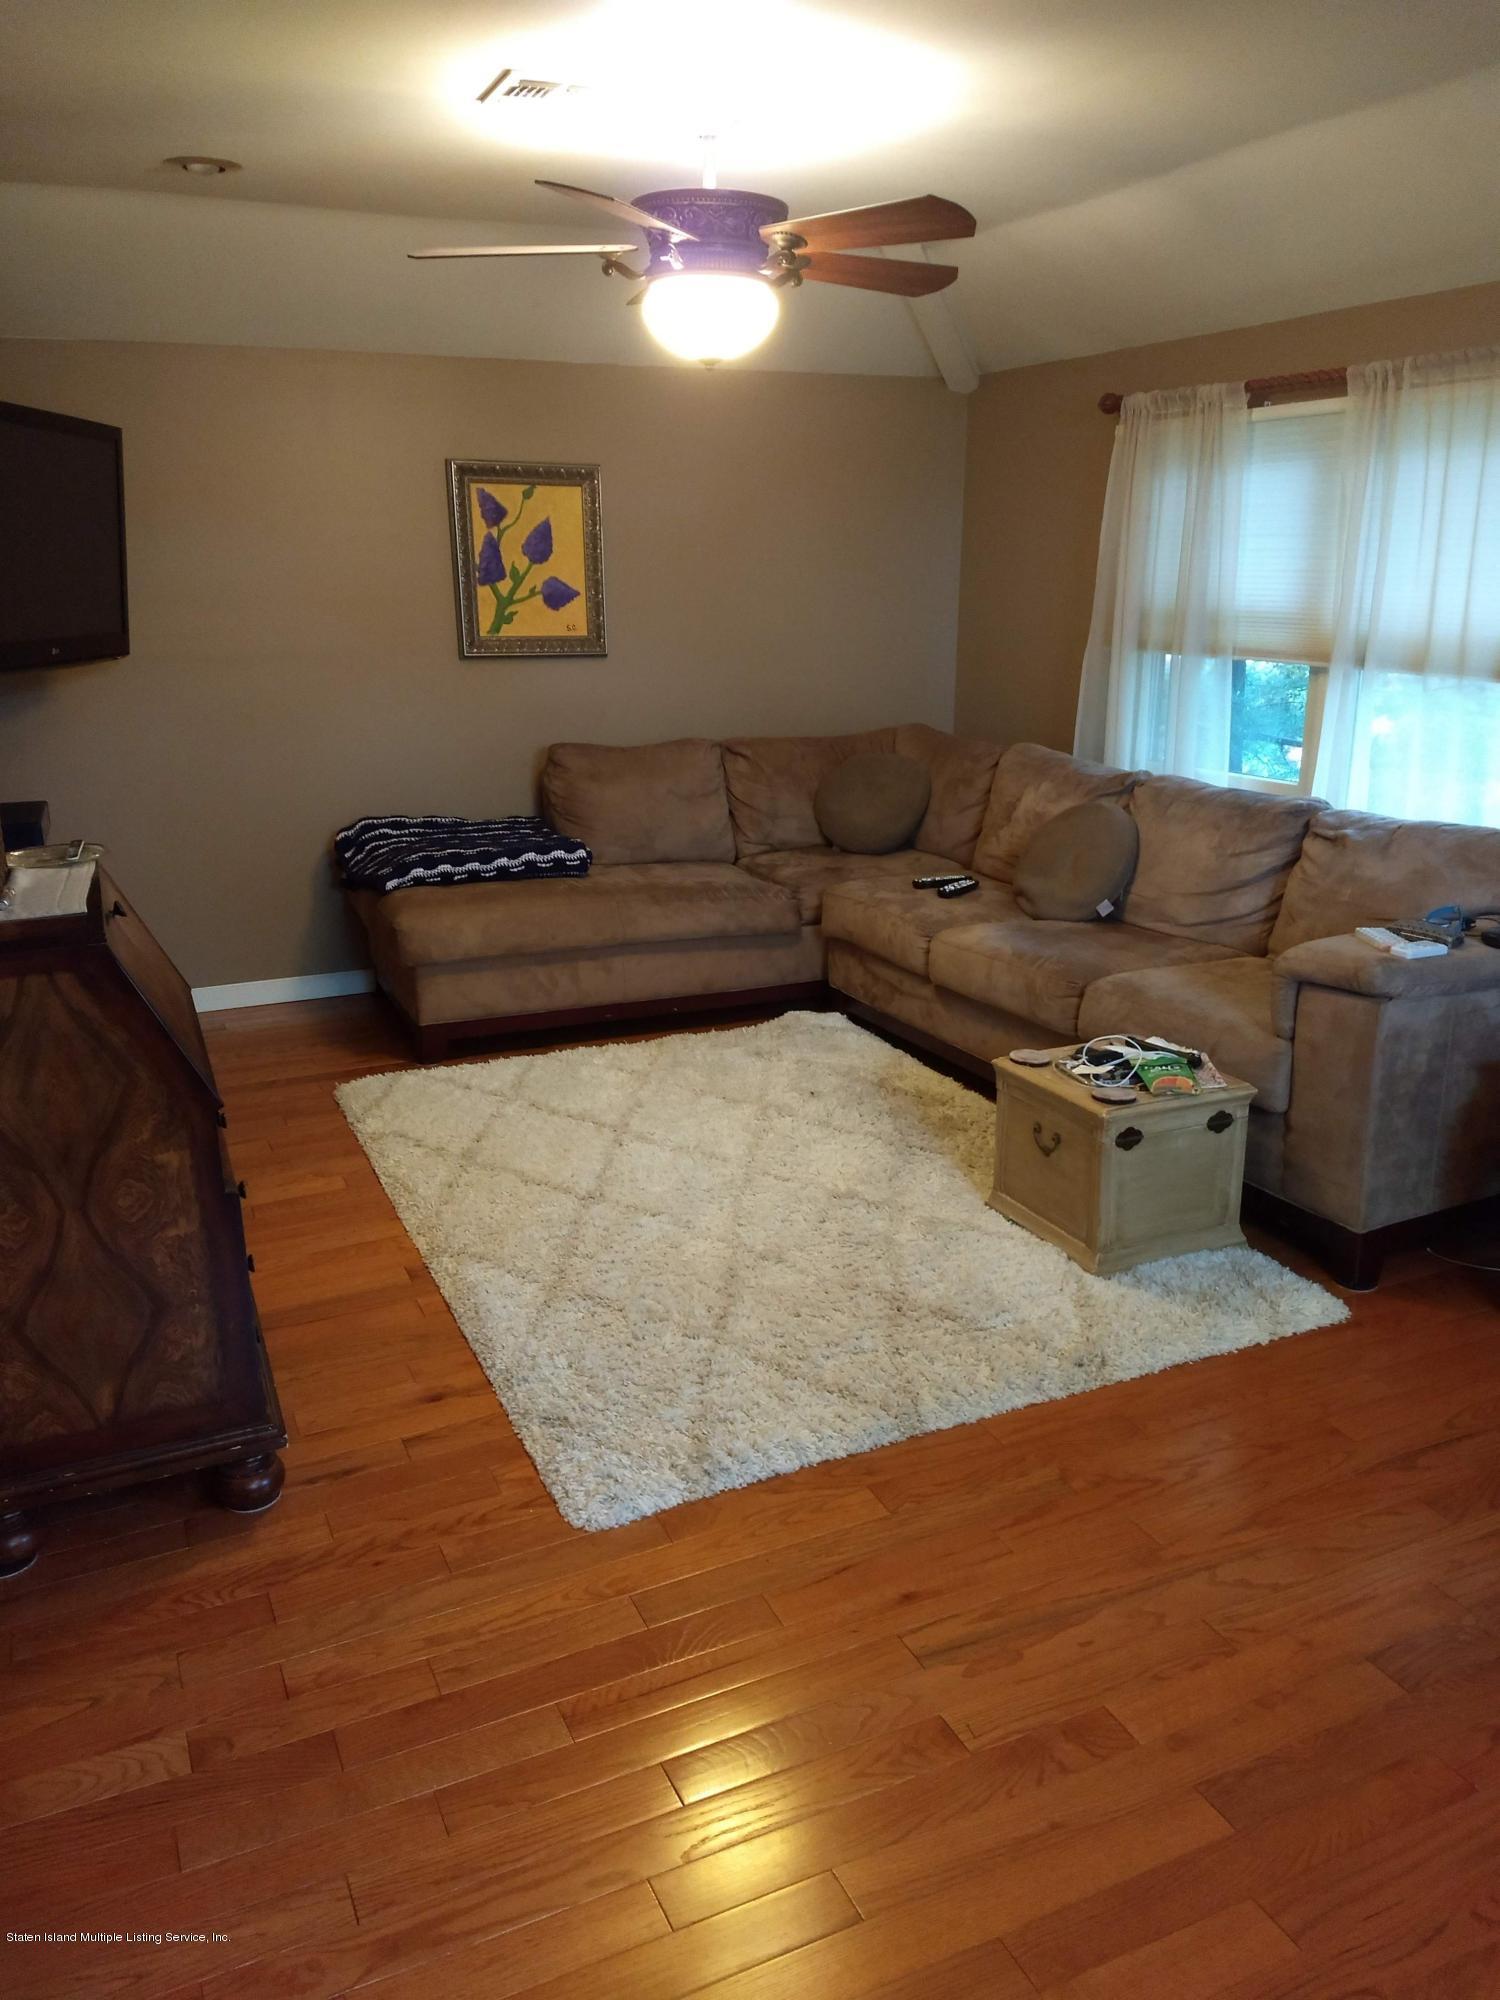 Single Family - Detached 45 Delmore Street  Staten Island, NY 10314, MLS-1128668-13